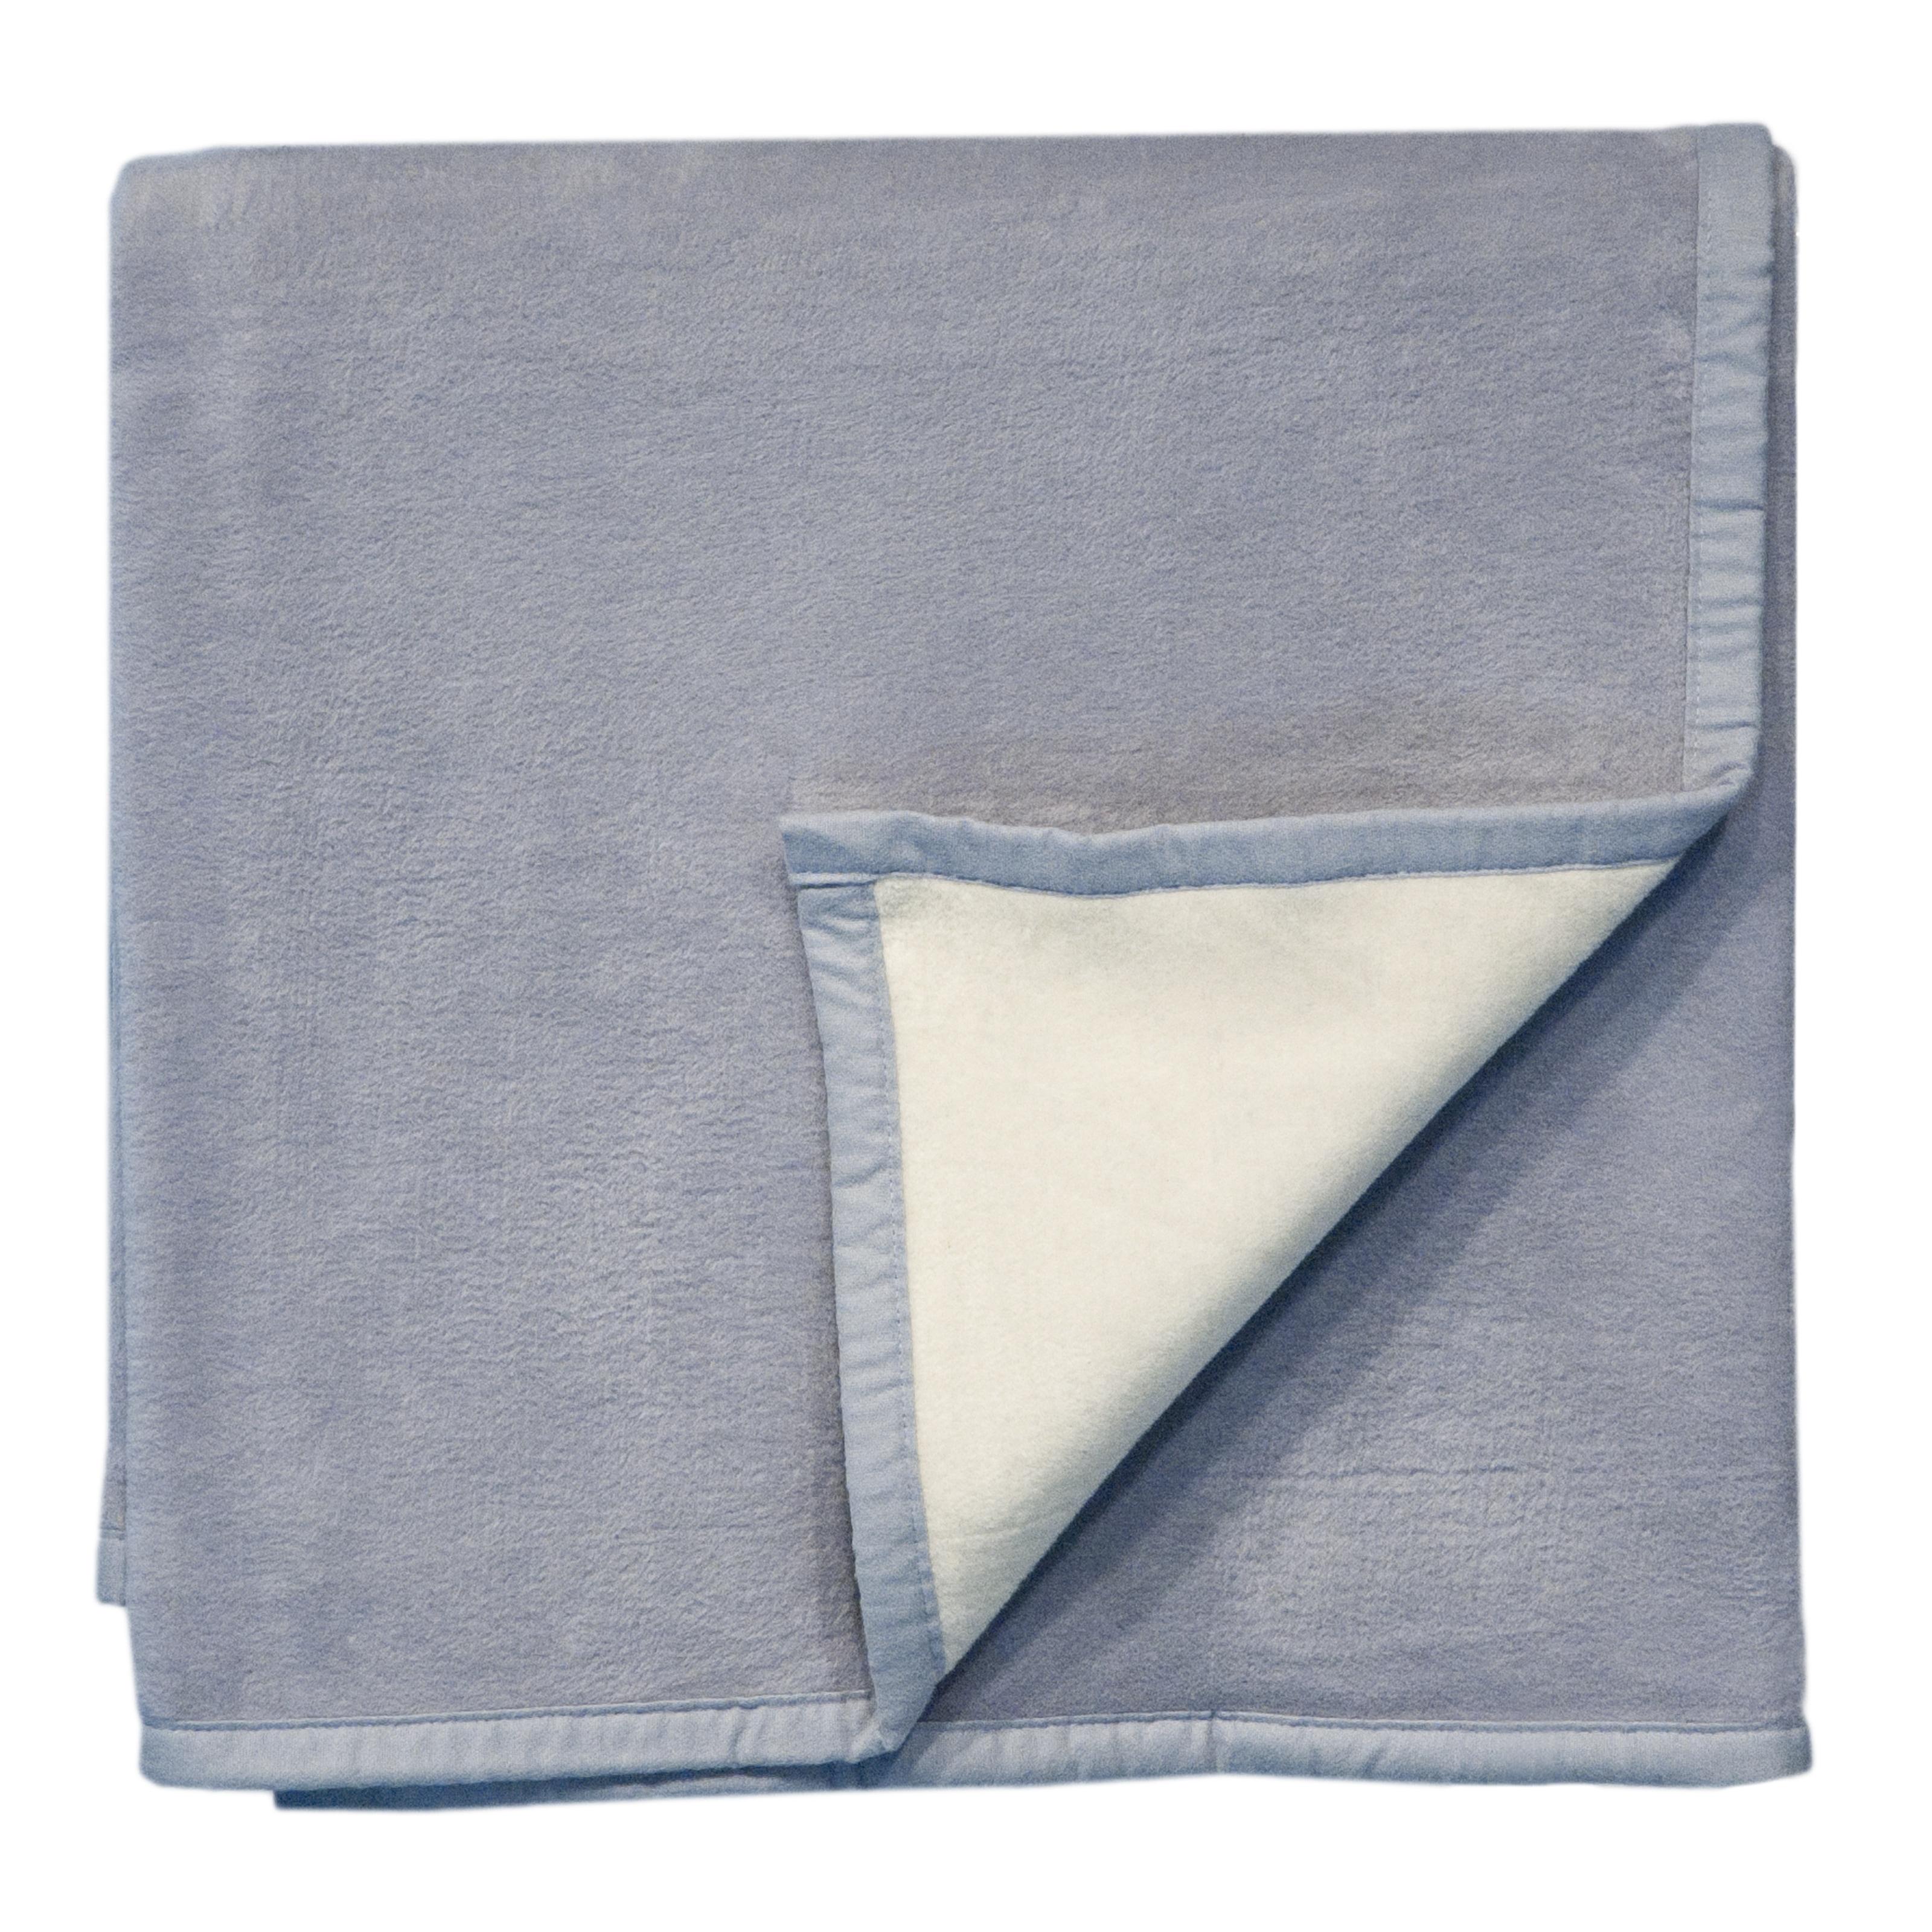 Bocasa Smoke Woven Organic Cotton Throw Blanket